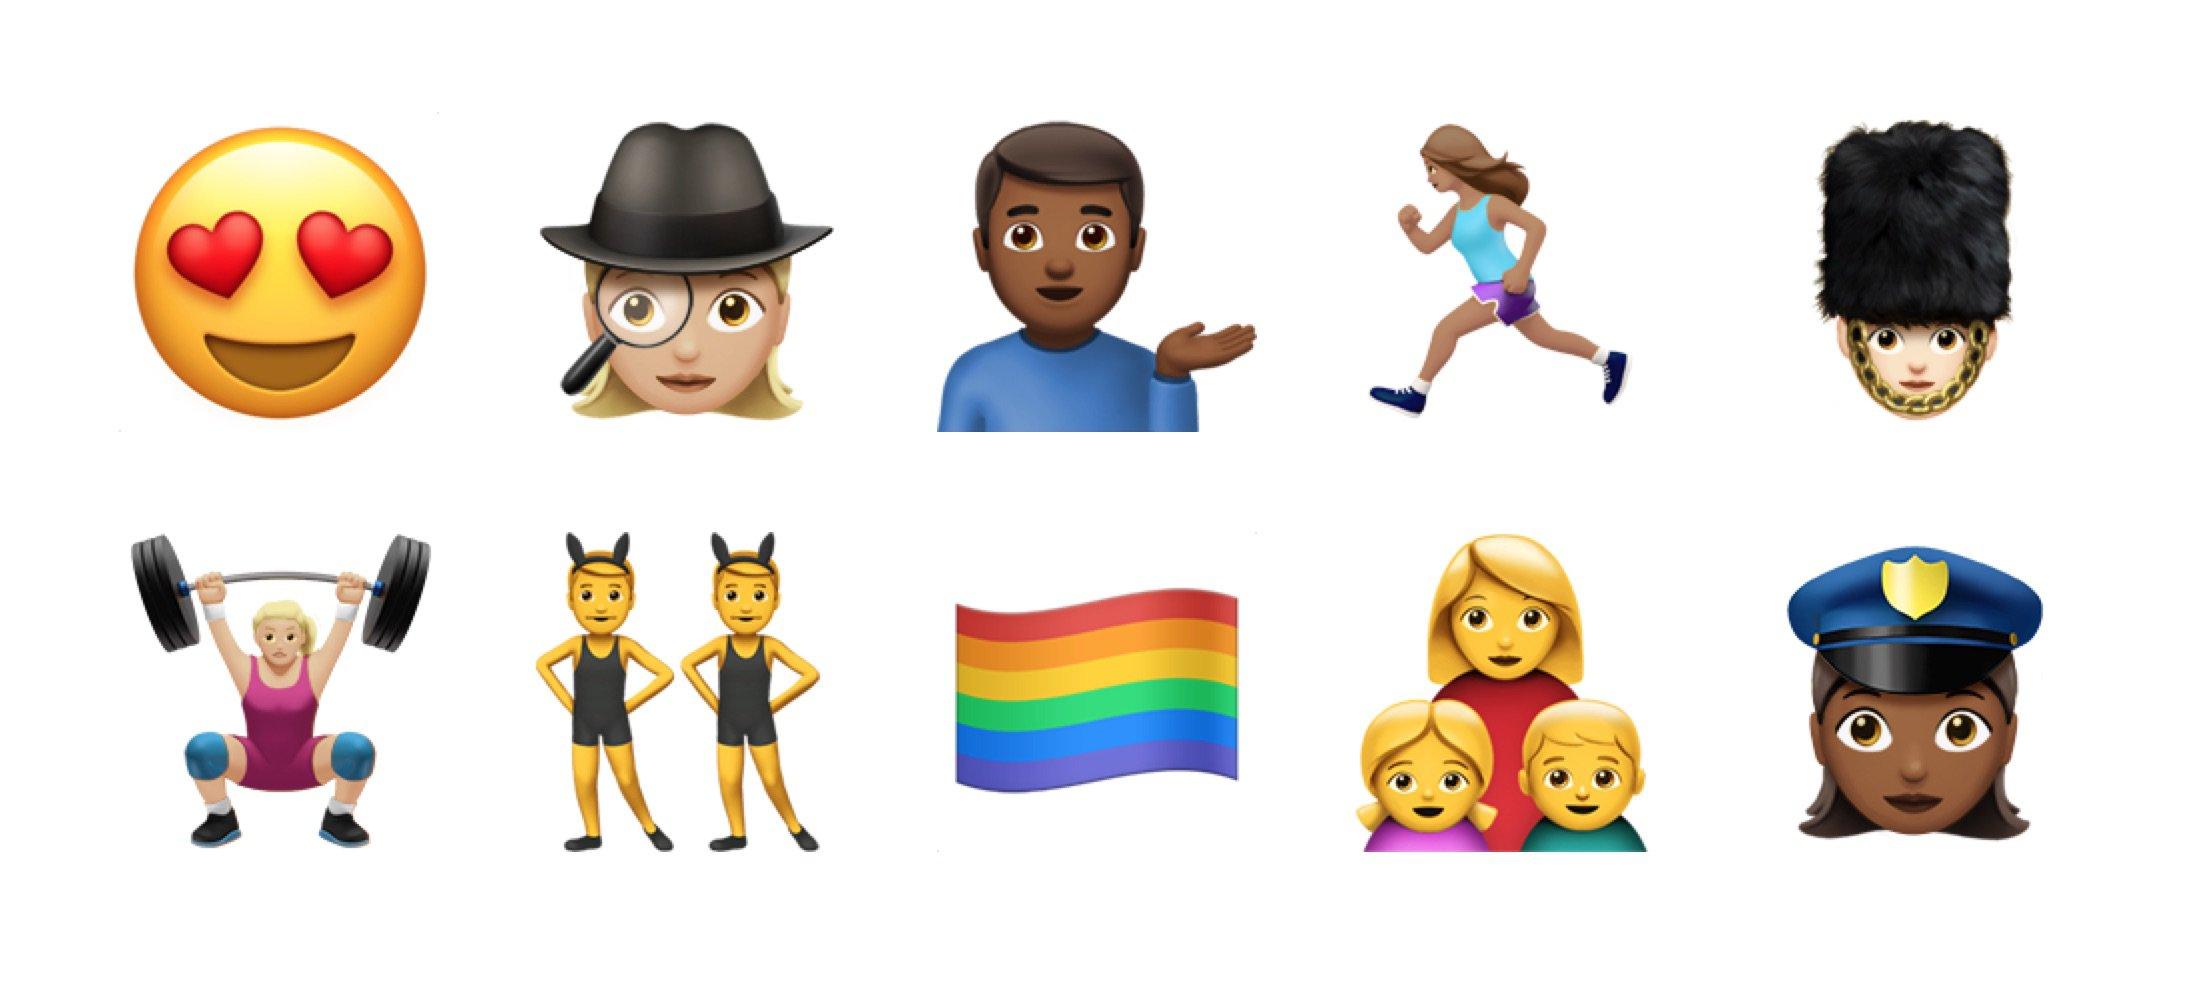 ios 10 emoji changelog boy running clipart black and white boy running track clipart